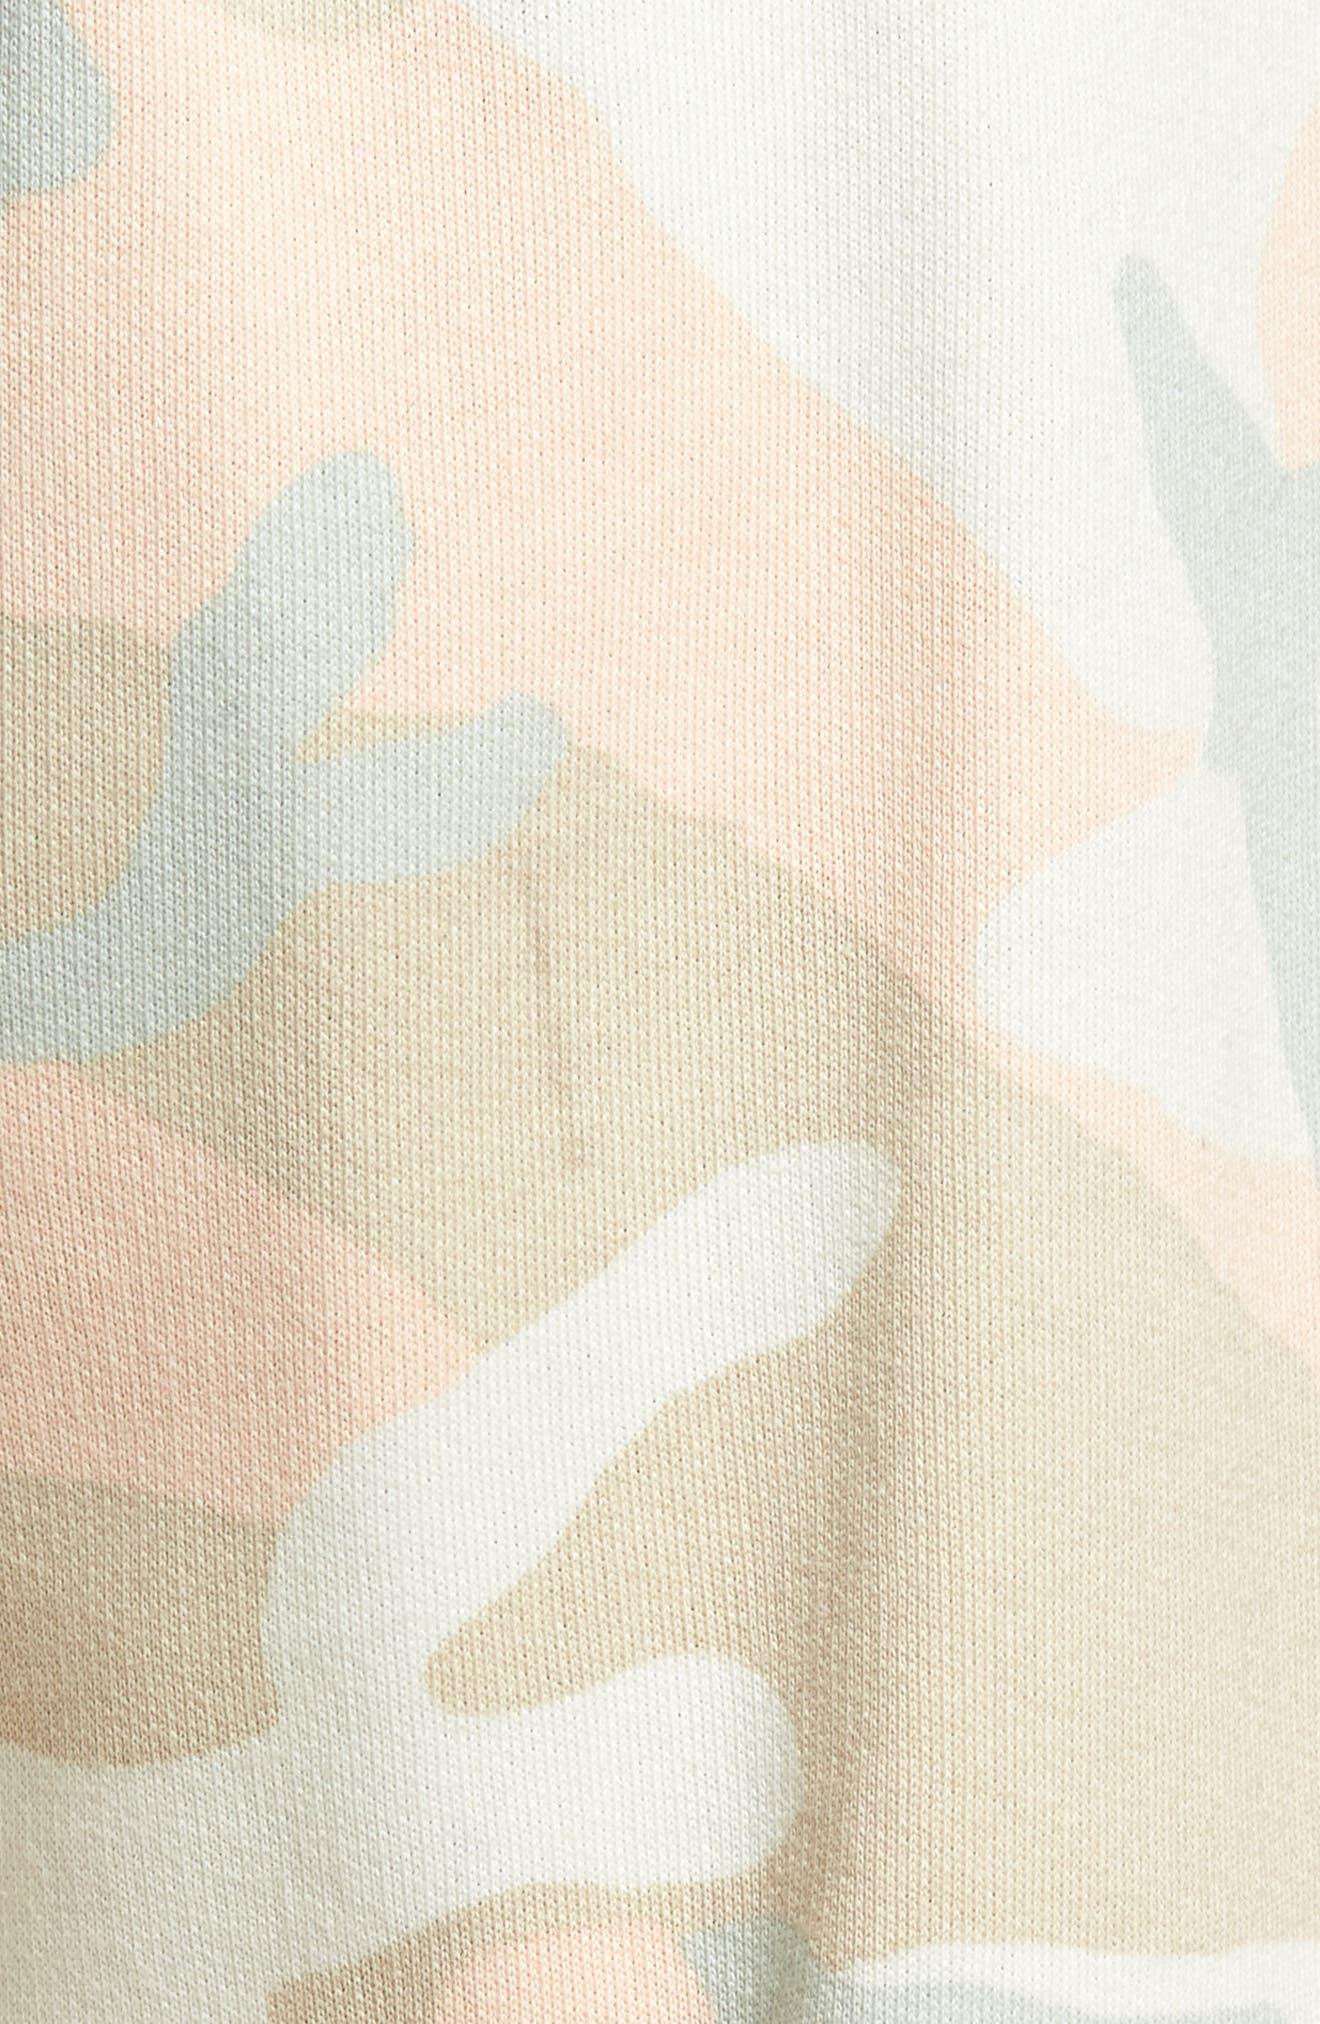 Marty Pastel Camo Fleece Shorts,                             Alternate thumbnail 5, color,                             650